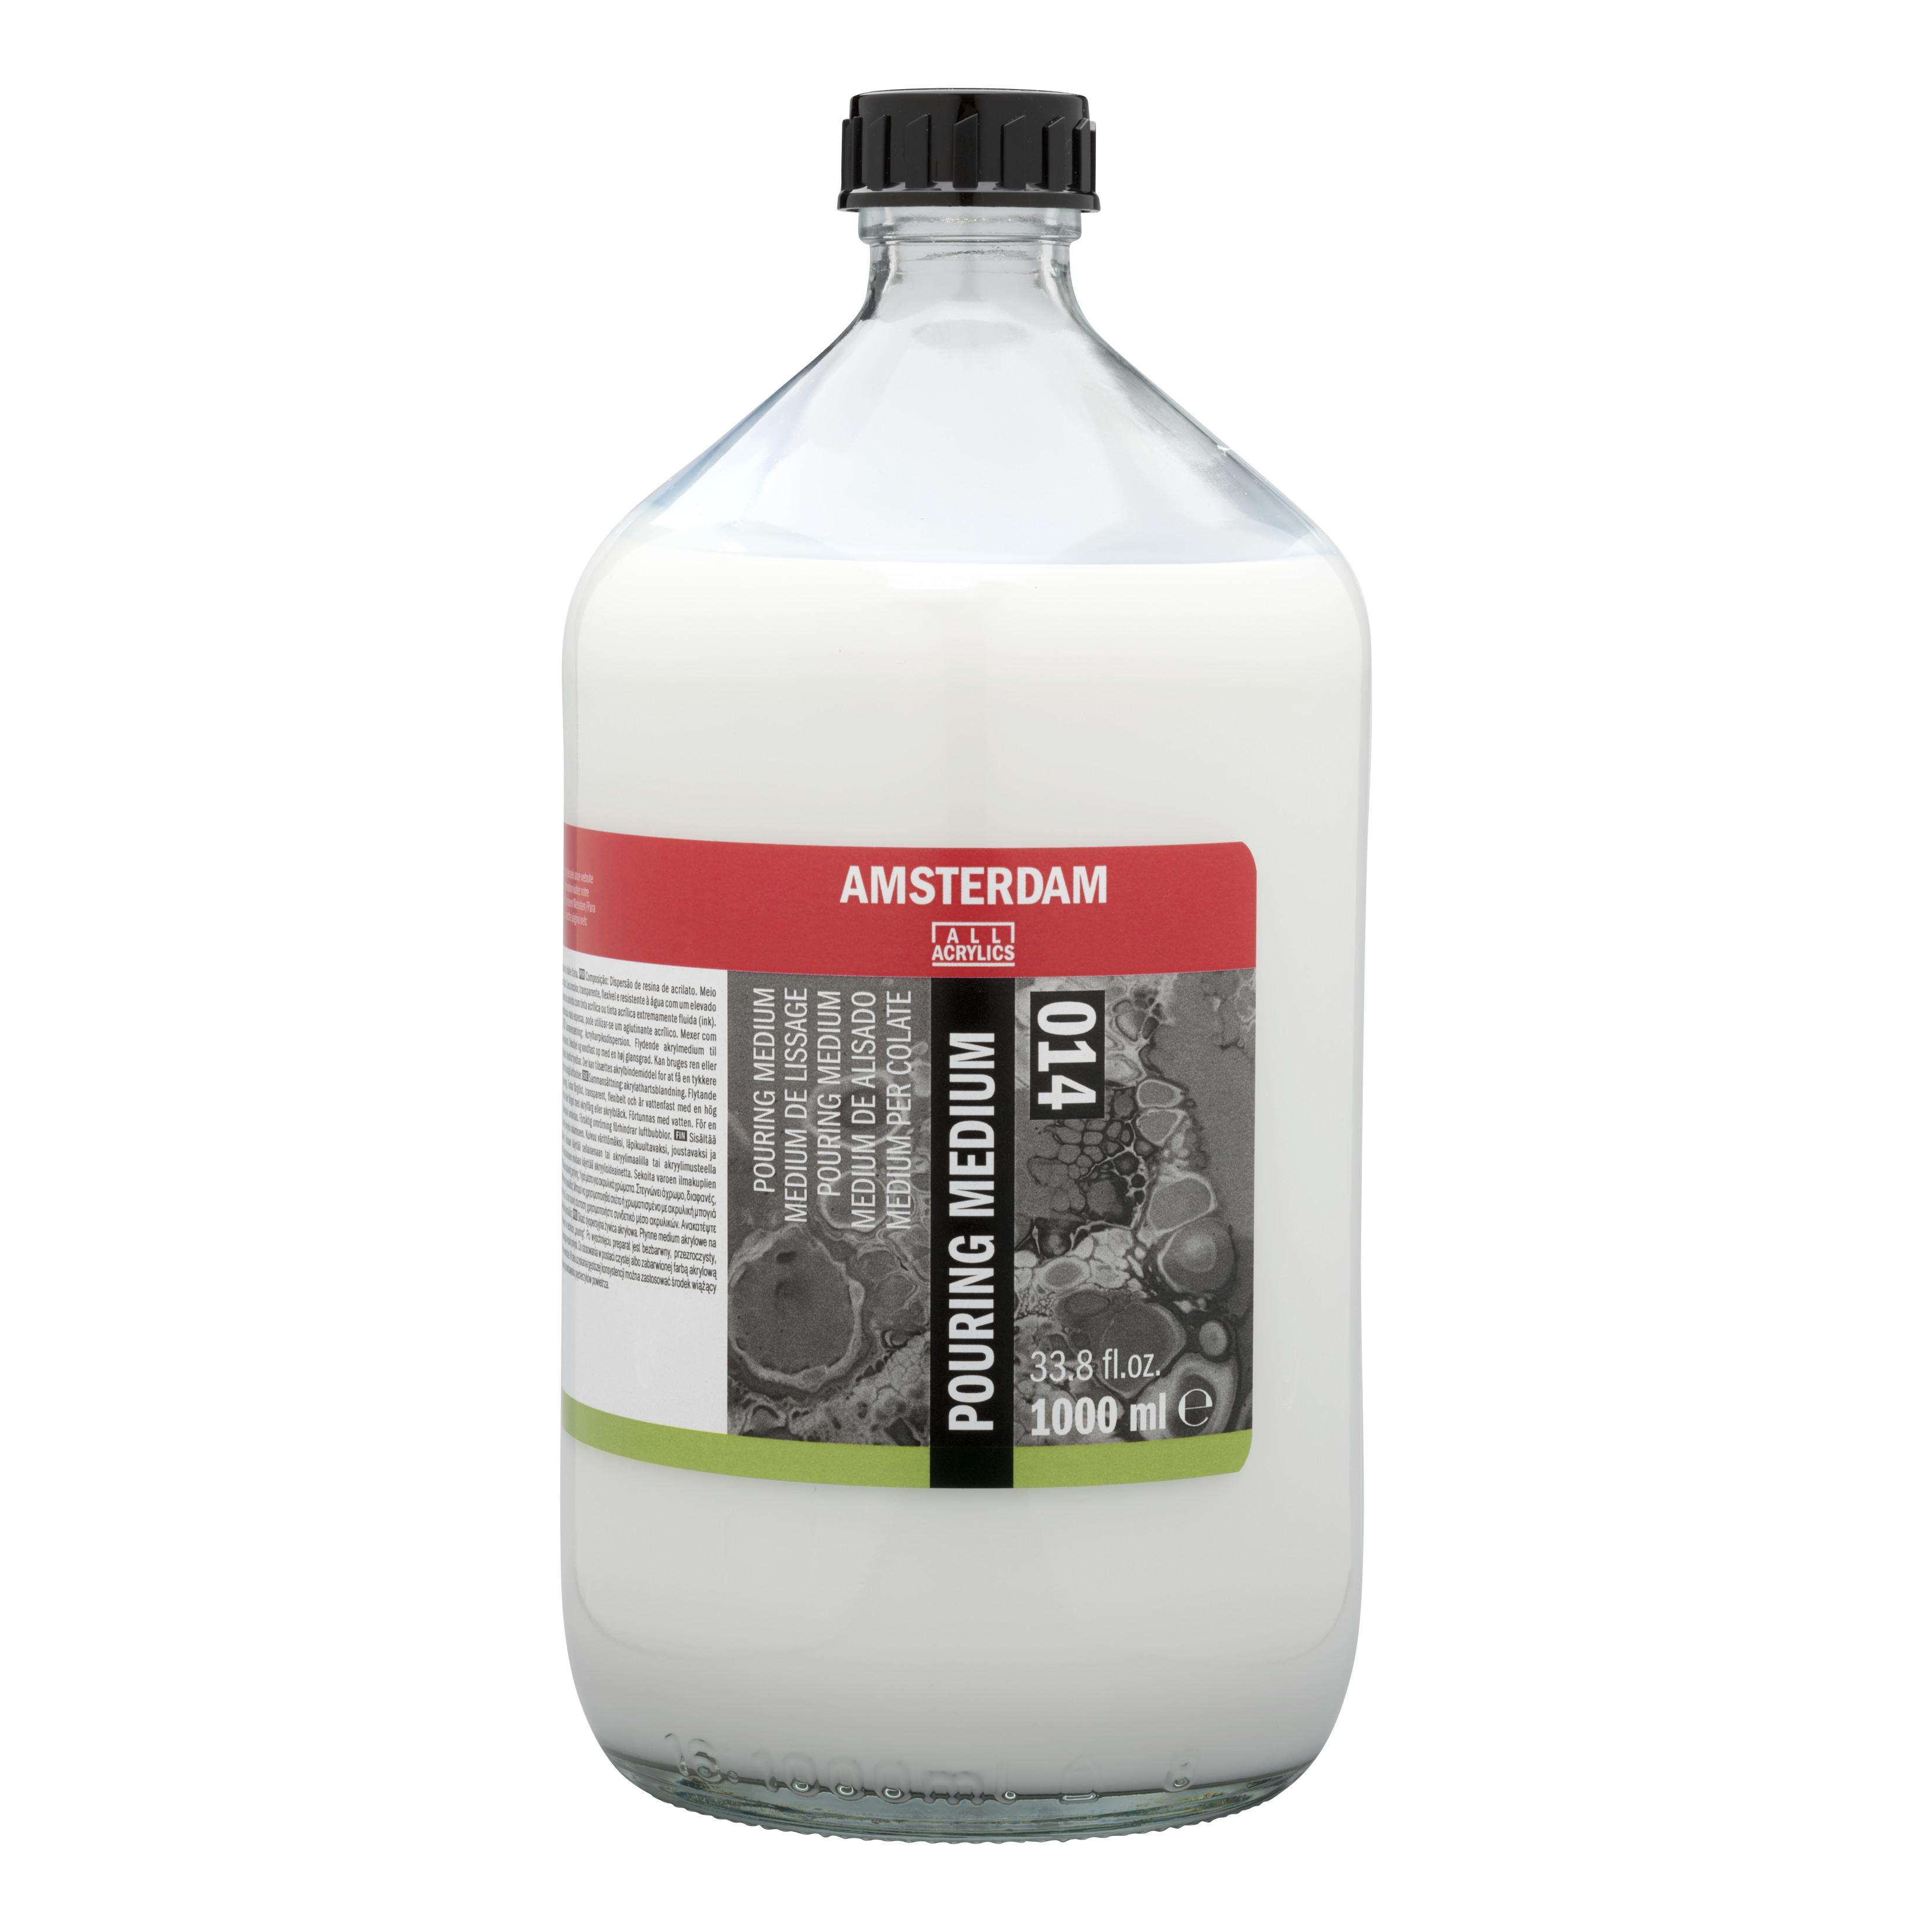 Amsterdam Pouring Medium 1000 ml